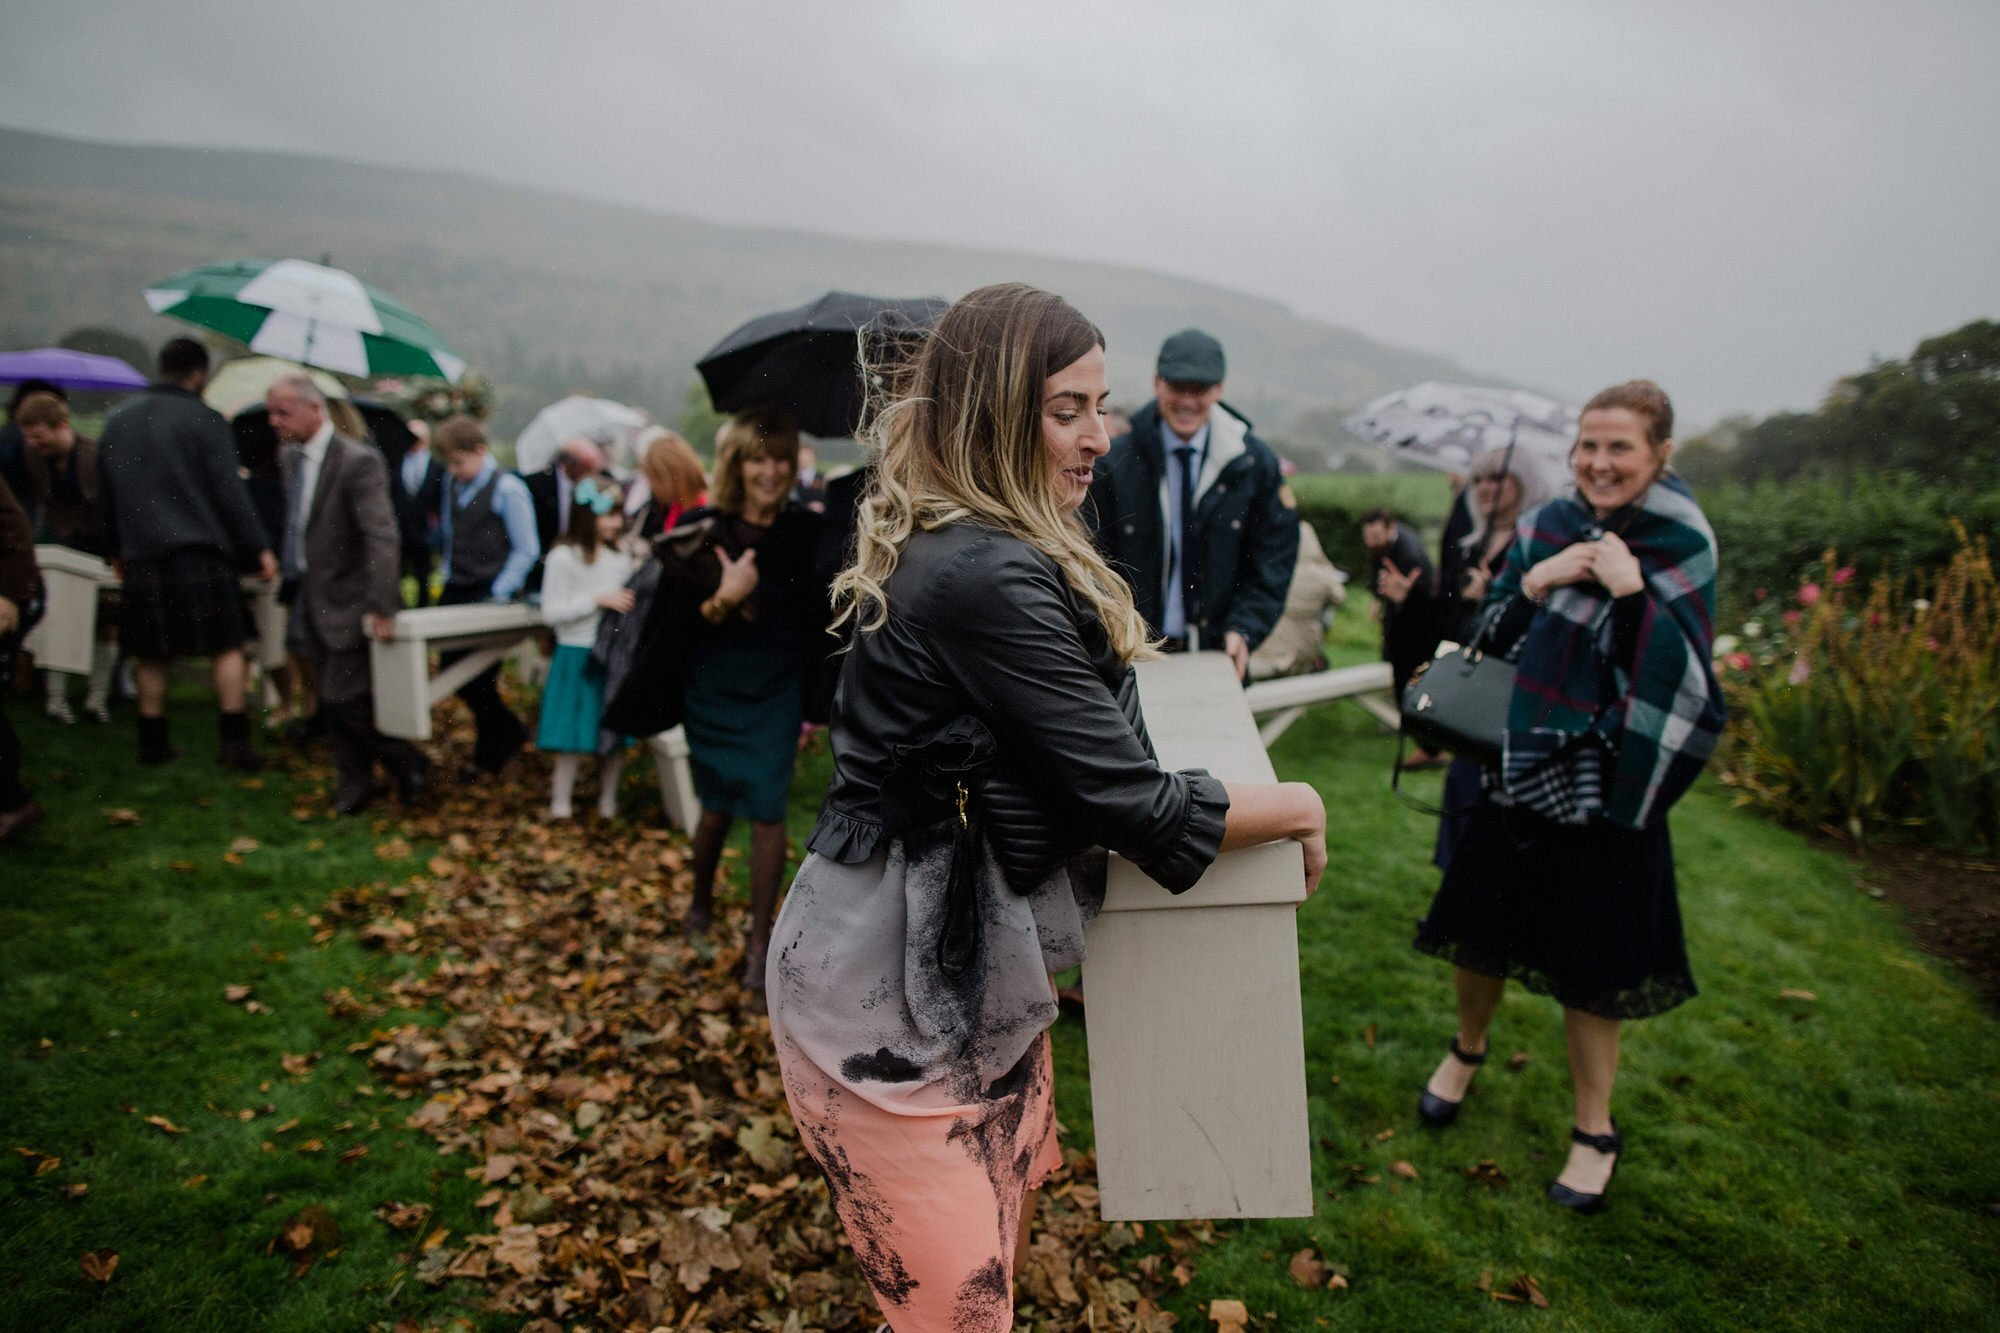 017 TIN SHED KNOCKRAICH FARM WEDDING ALTERNATIVE BRIDE ZOE ALEXANDRA PHOTOGRAPHY